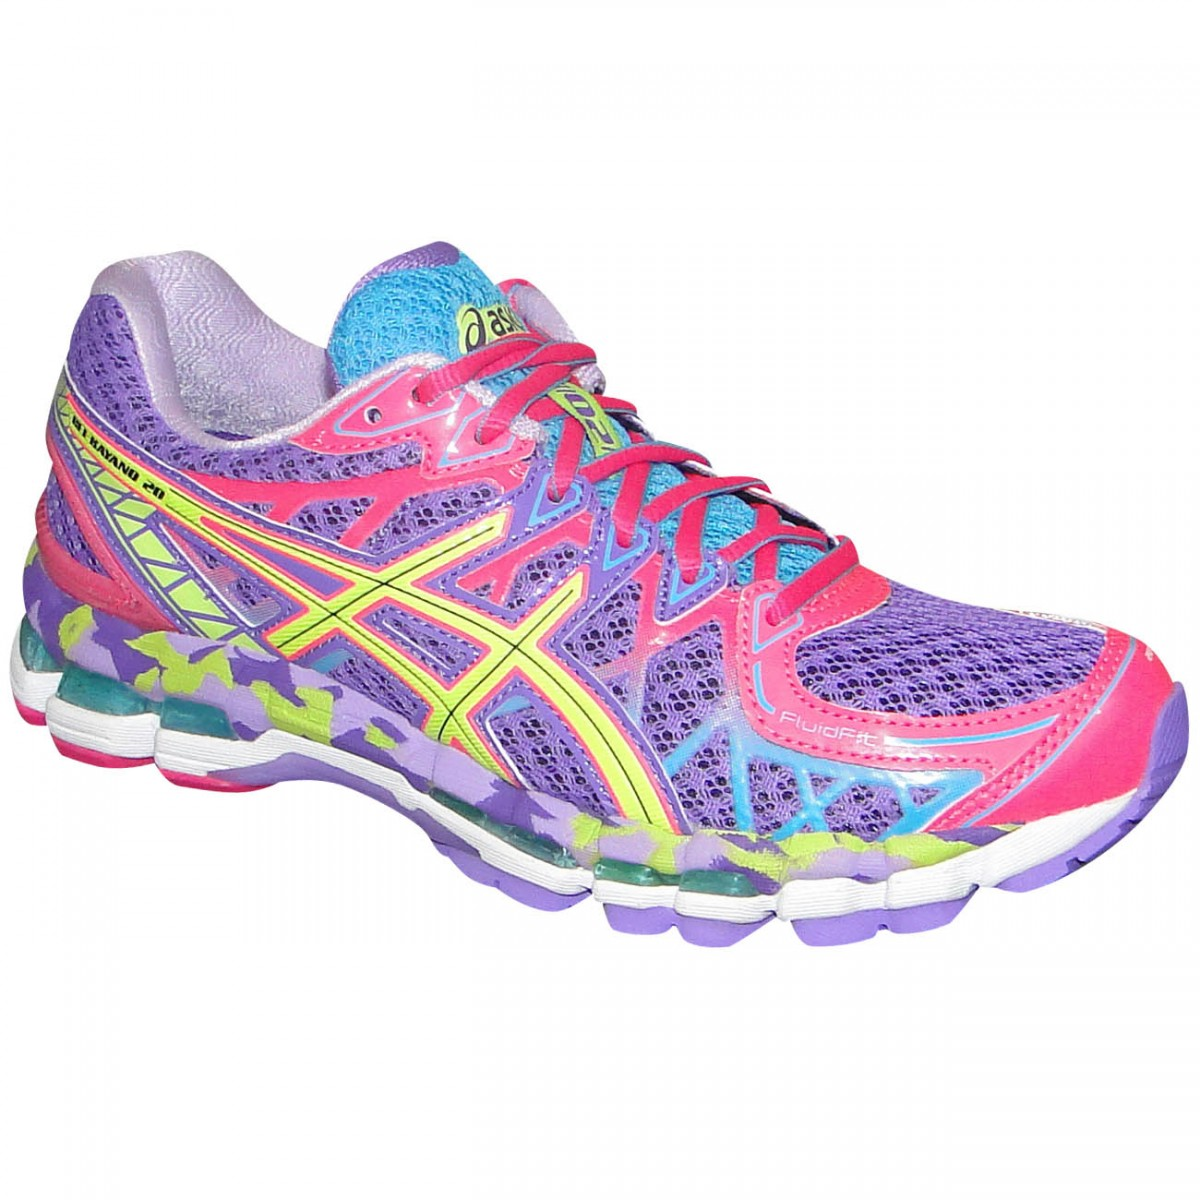 0b79ca1b106 Tenis Asics Gel-Kayano 20 T3N7Q 4807 - Lilas Pink Limão - Chuteira Nike